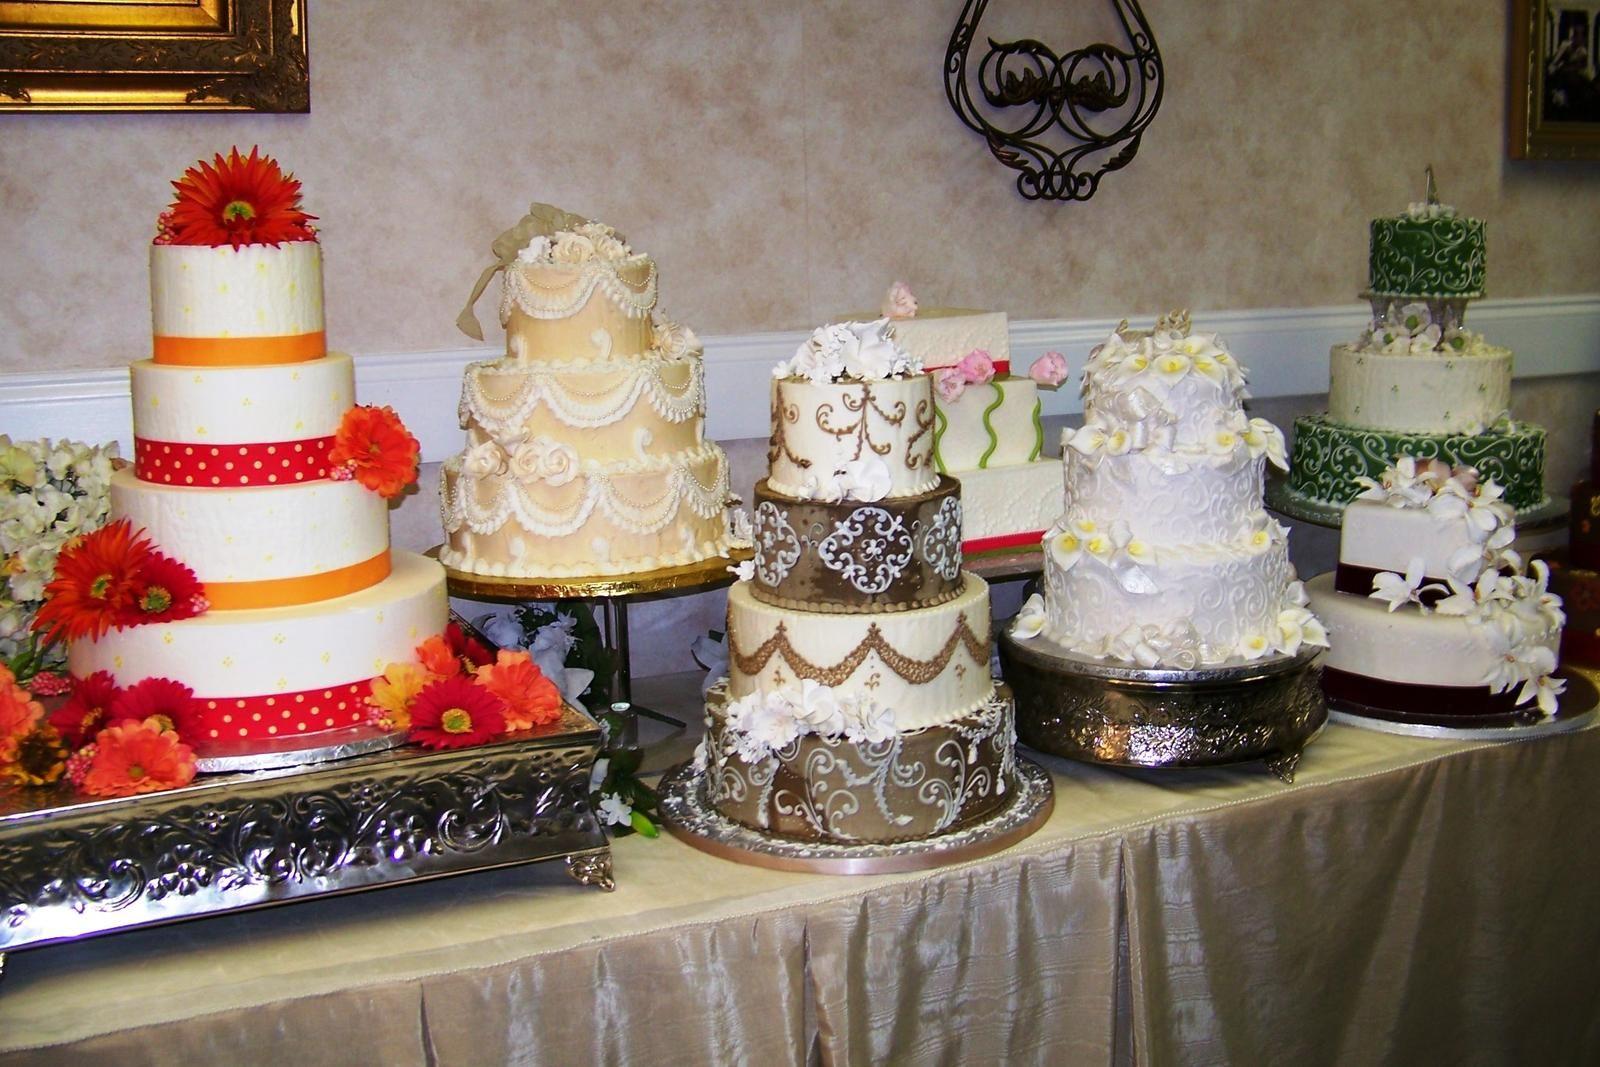 Cake boss cakes cakes cake boss yummy cakes